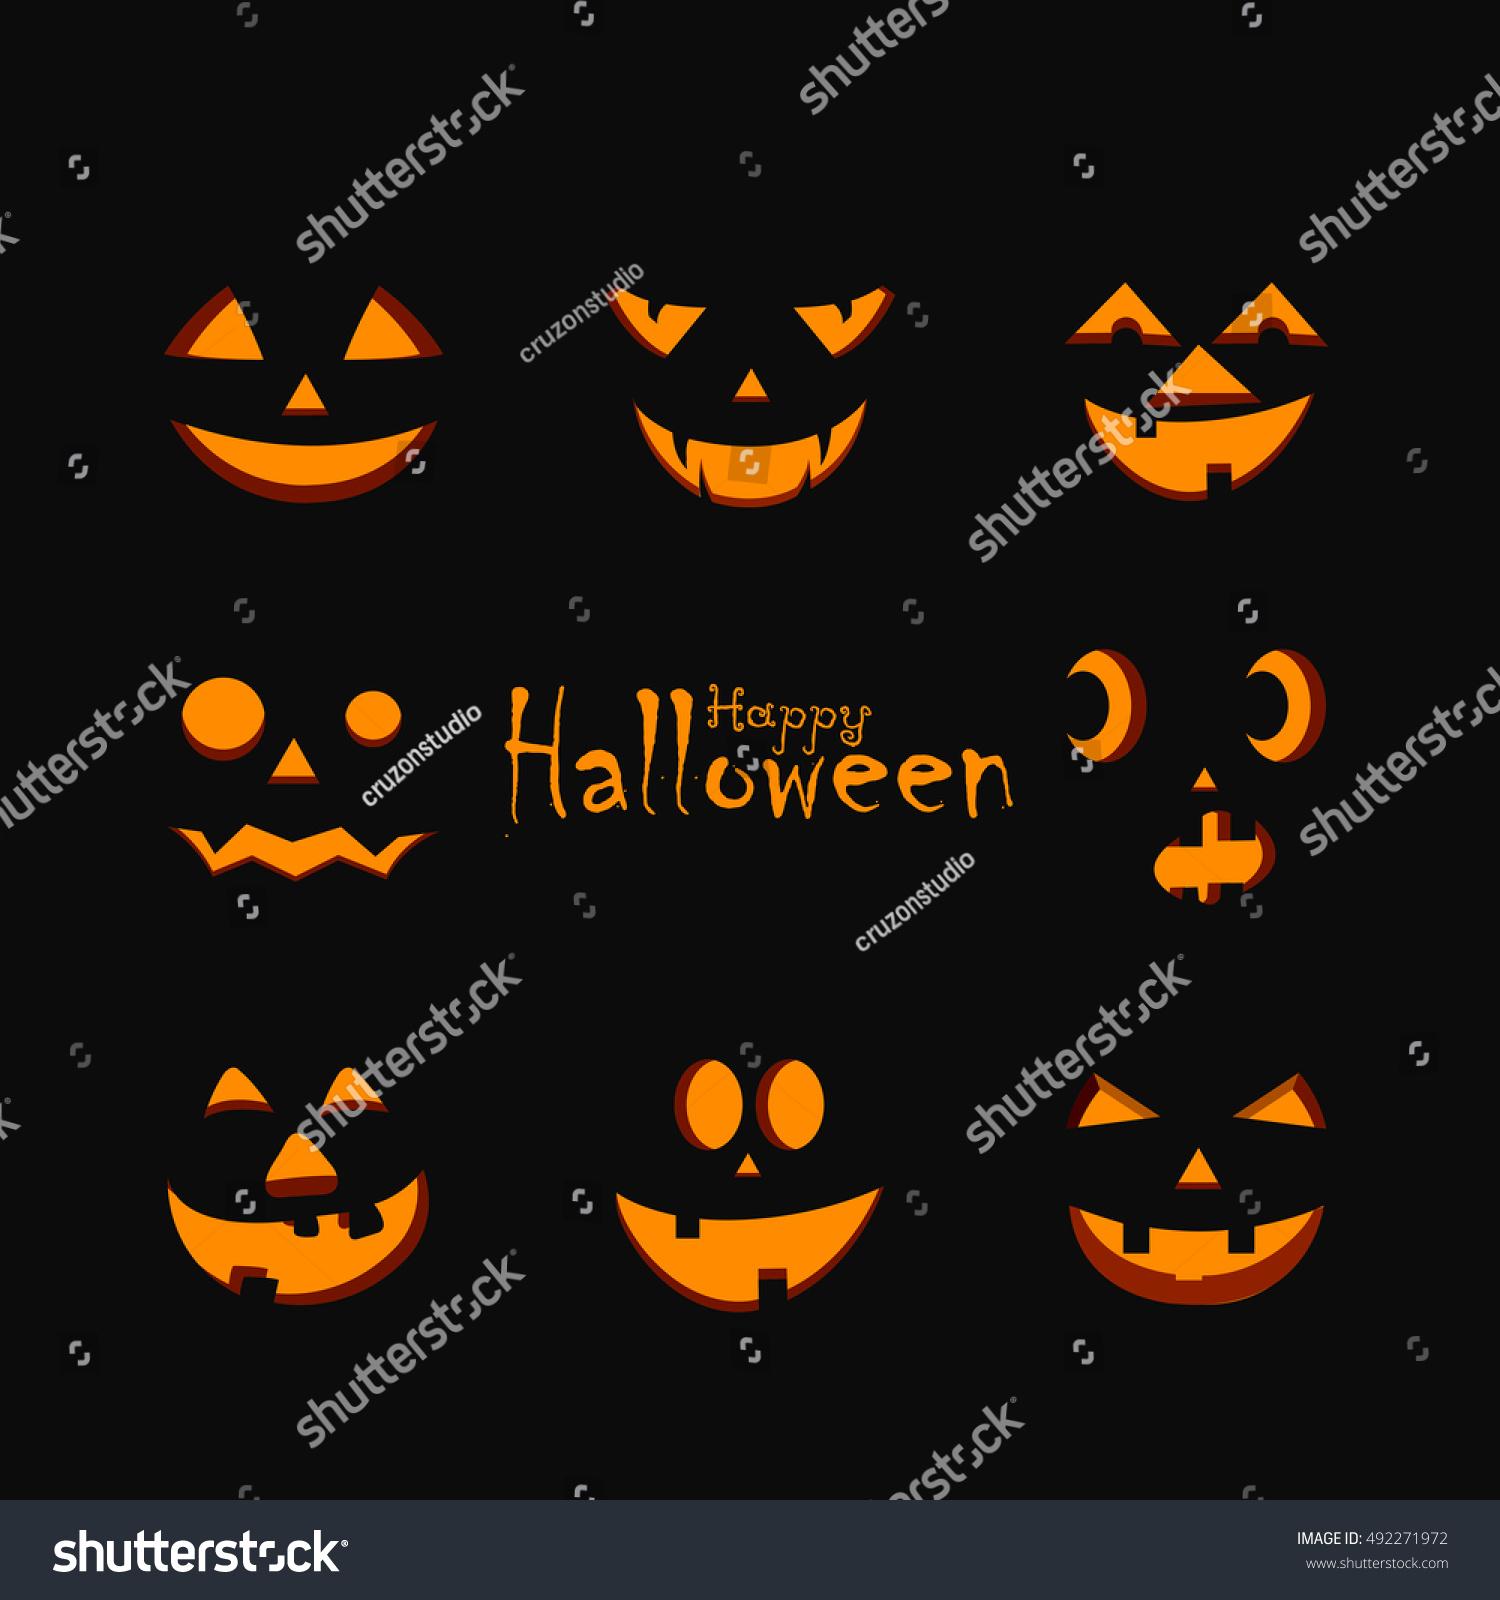 halloween party background,happy halloween message design background